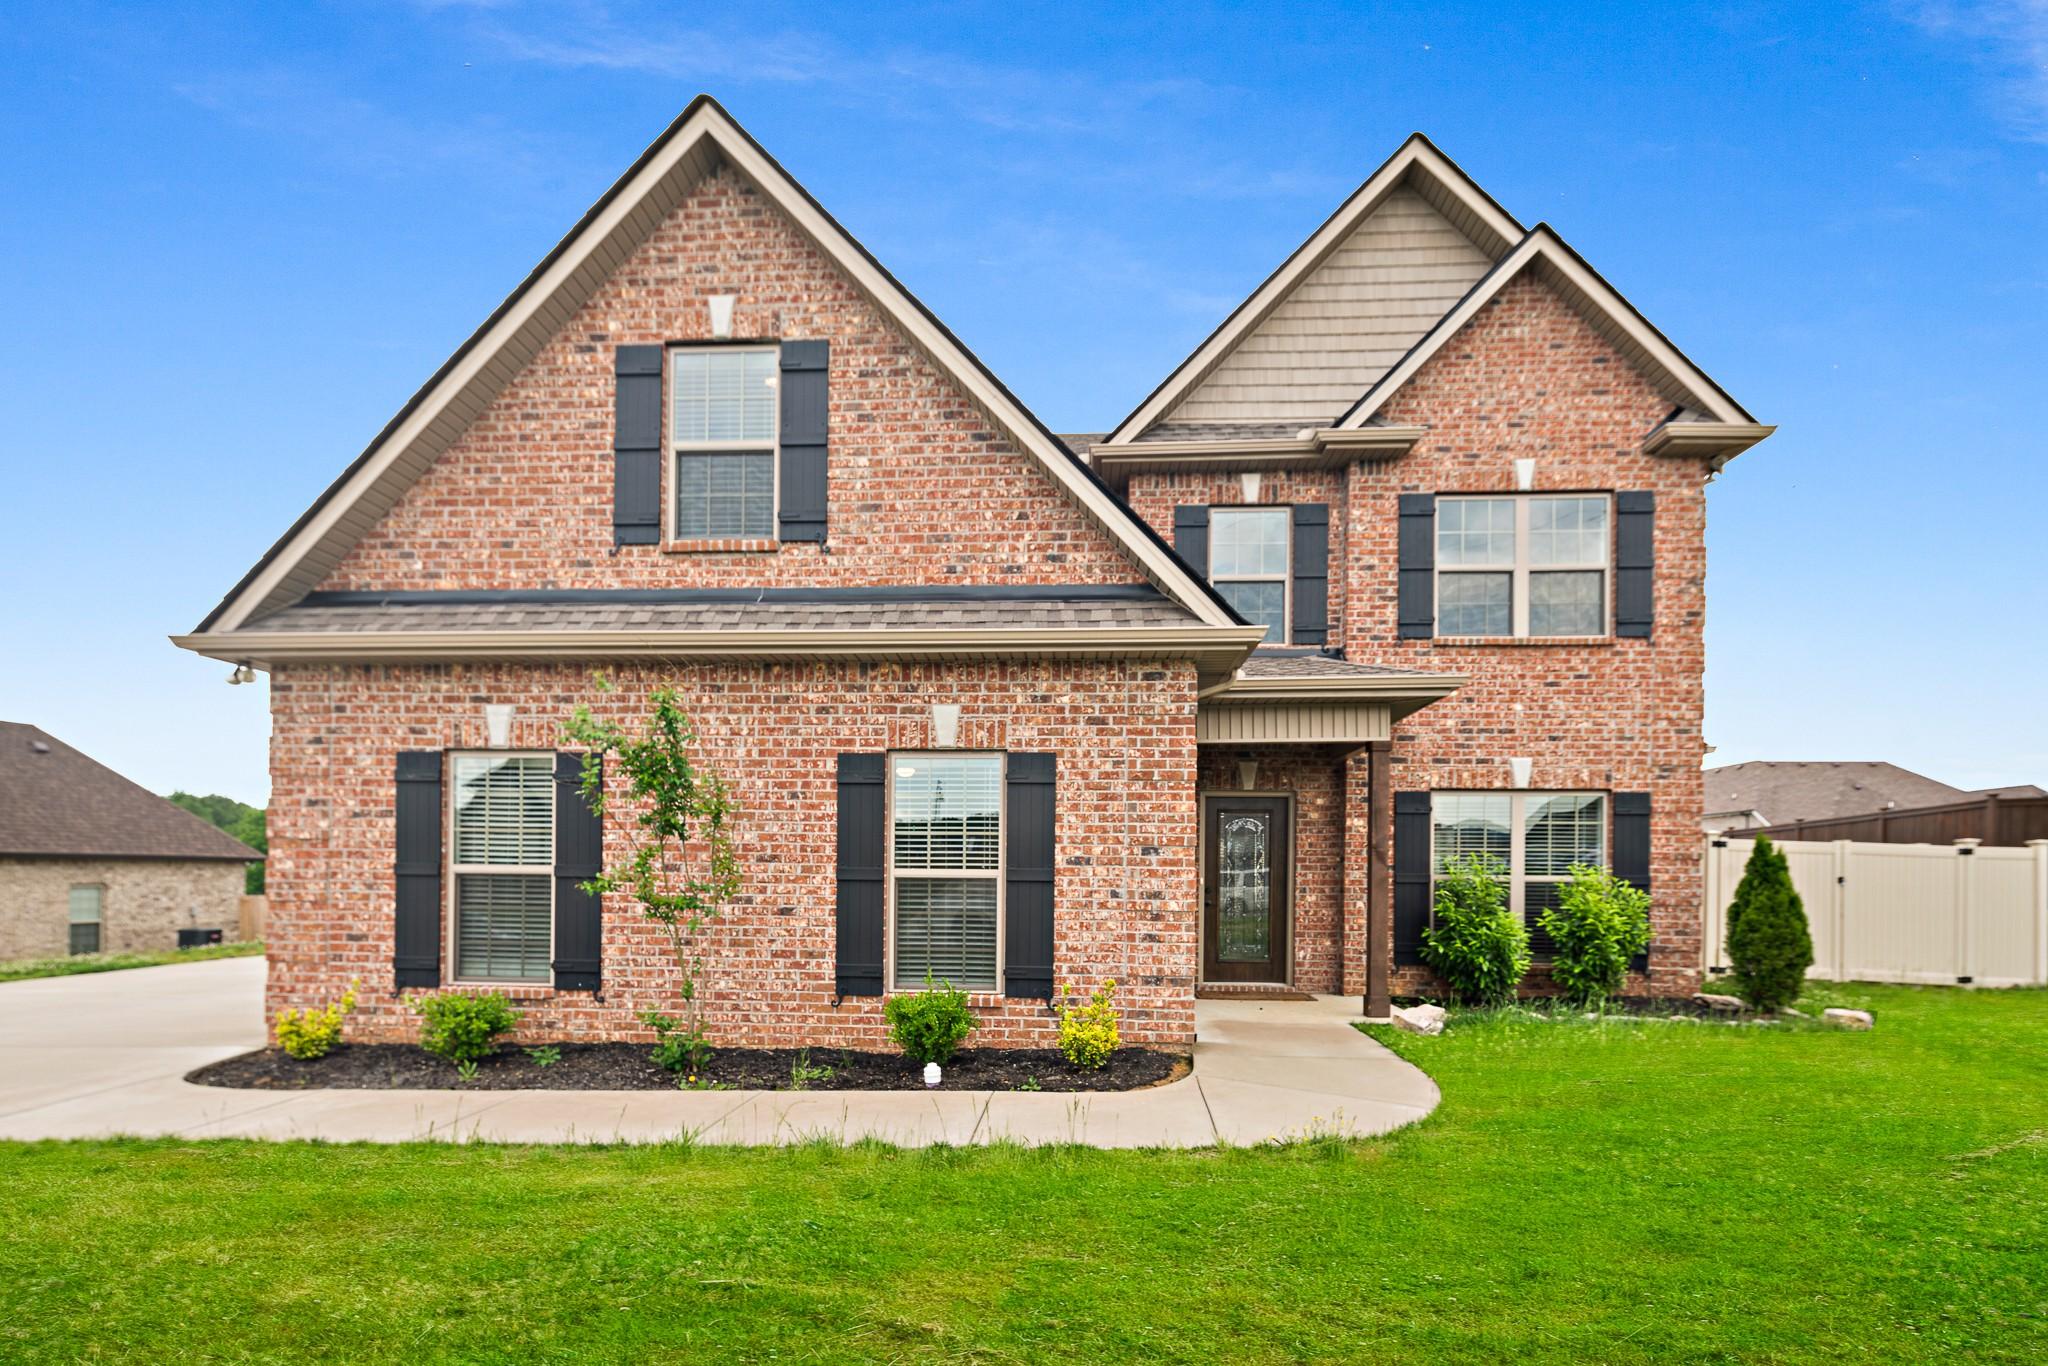 1118 Bandini Ct Property Photo - Lascassas, TN real estate listing